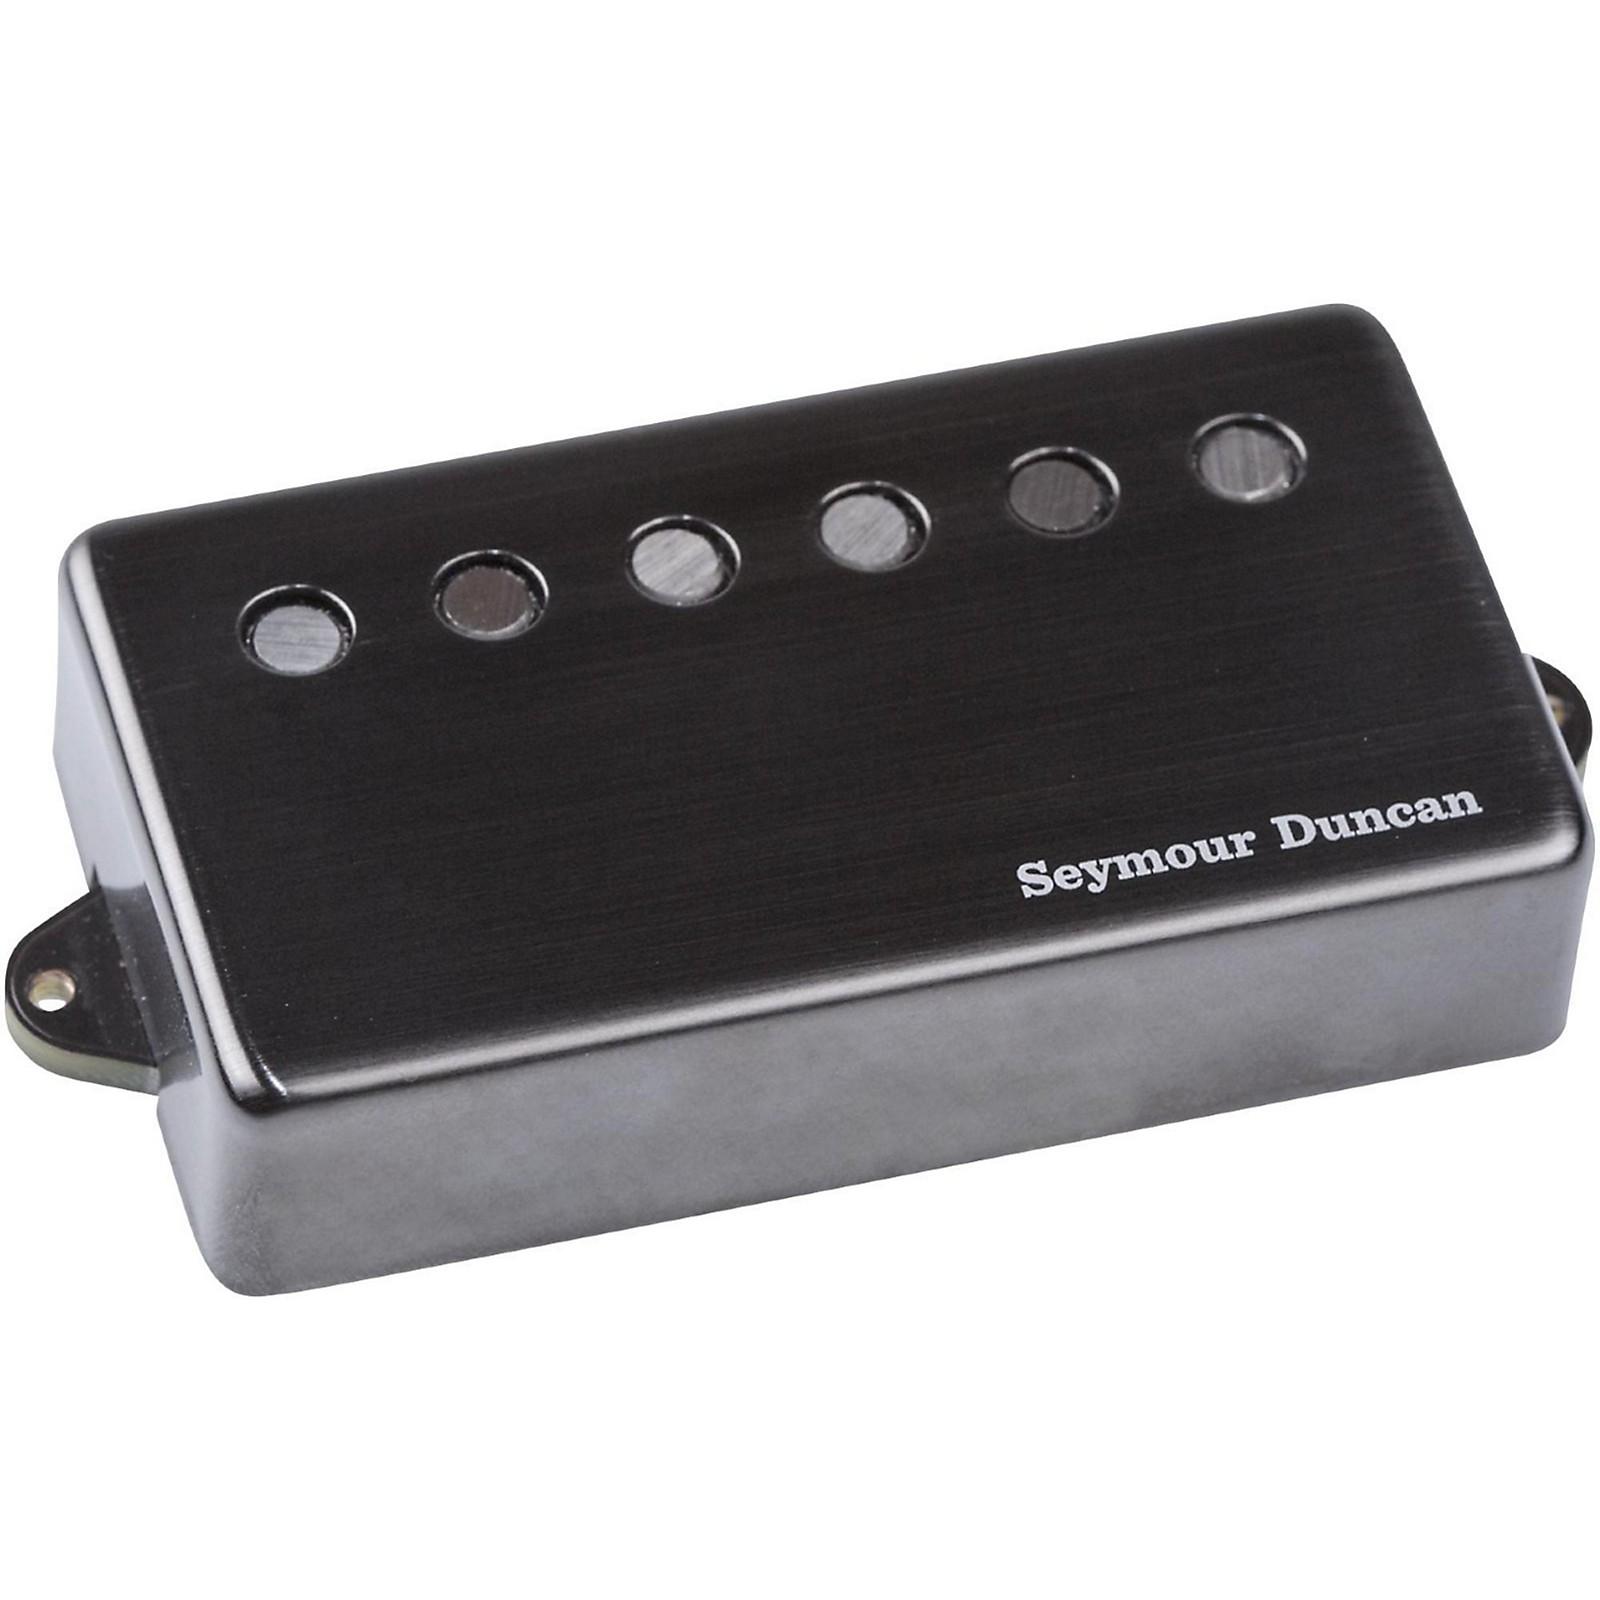 Open Box Seymour Duncan Jeff Loomis Blackouts Neck Humbucker Guitar Pickup